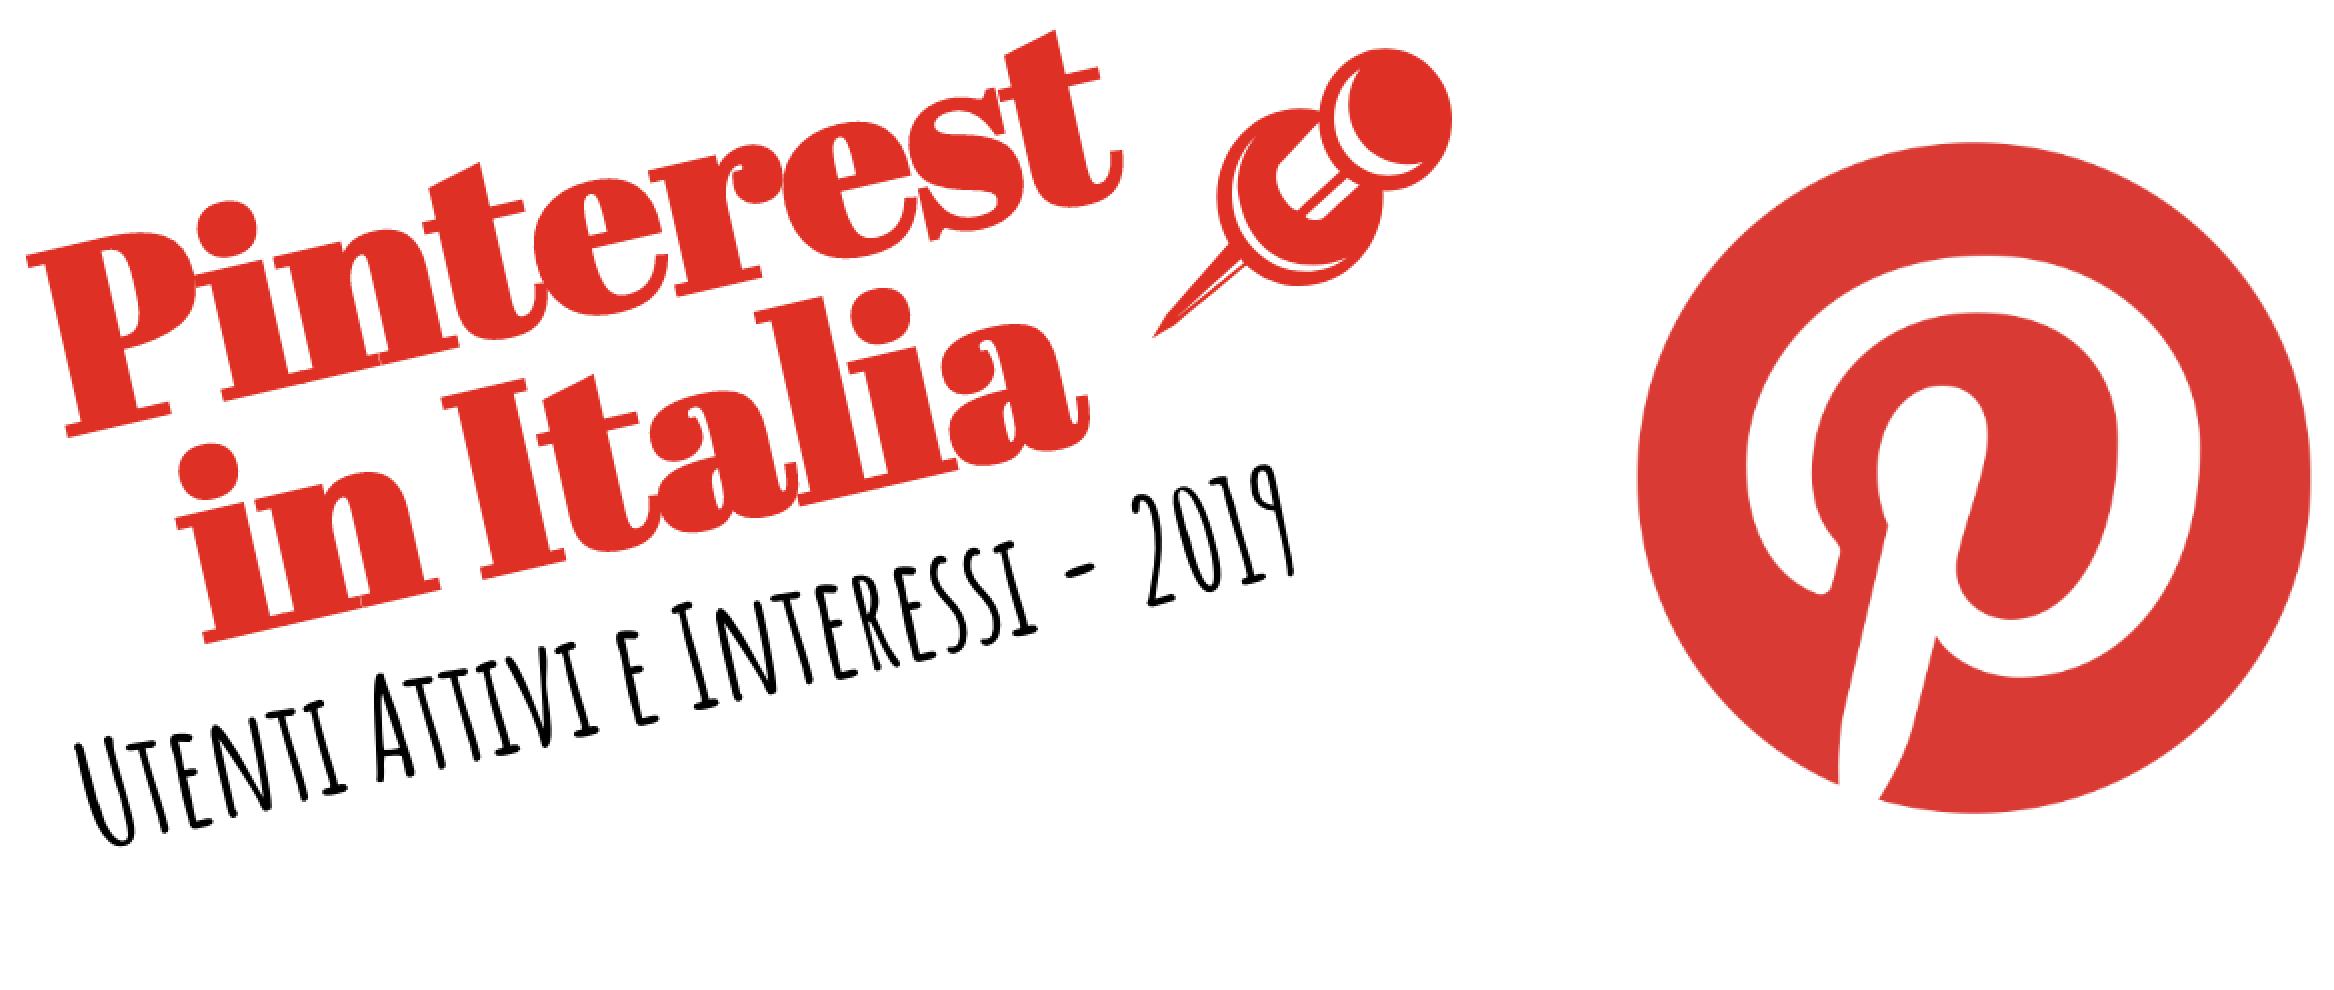 Dati Pinterest in Italia nel 2019